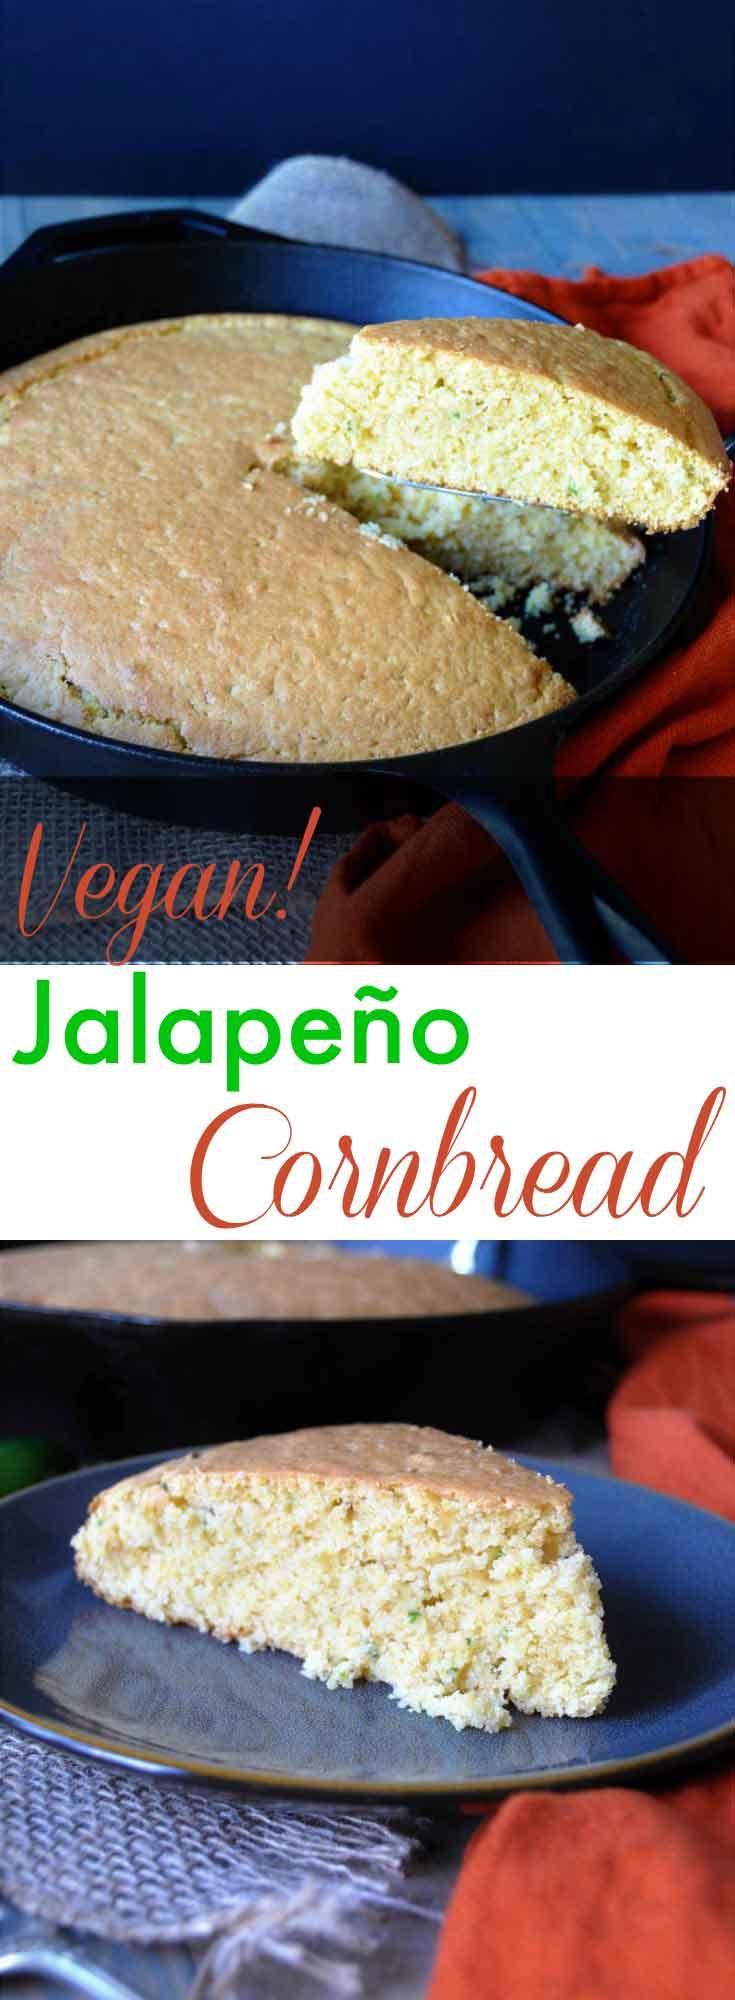 Spicy dairy-free, egg-free, and vegan jalapeño cornbread! So moist and delicious! www.veganosity.com